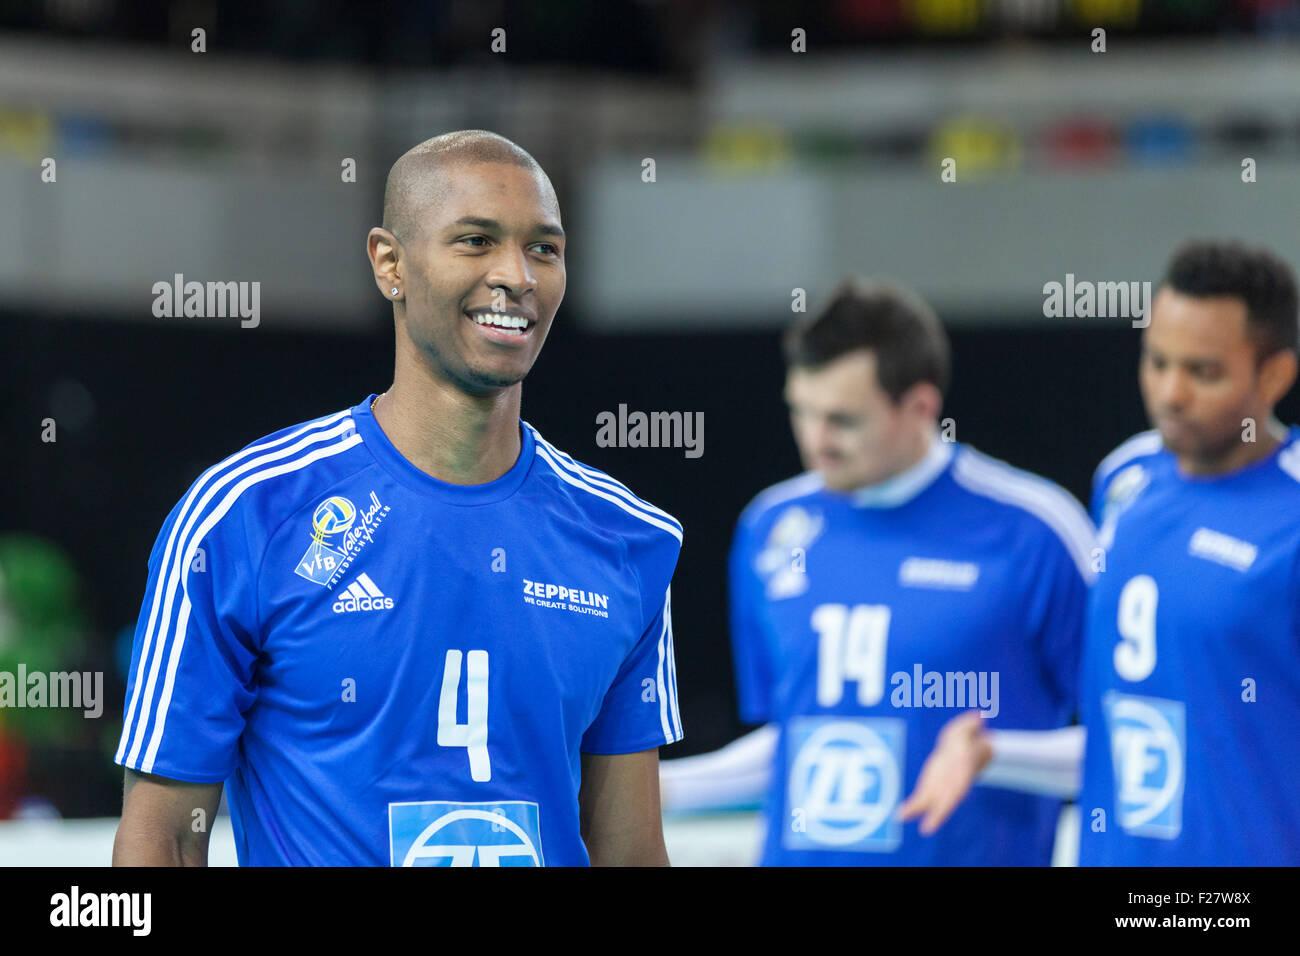 Copper Box Arena, London, UK. 13th Sep. 2015. Luis Joventino Venceslau celebrates a point. VfB Friedrichshafen beat - Stock Image